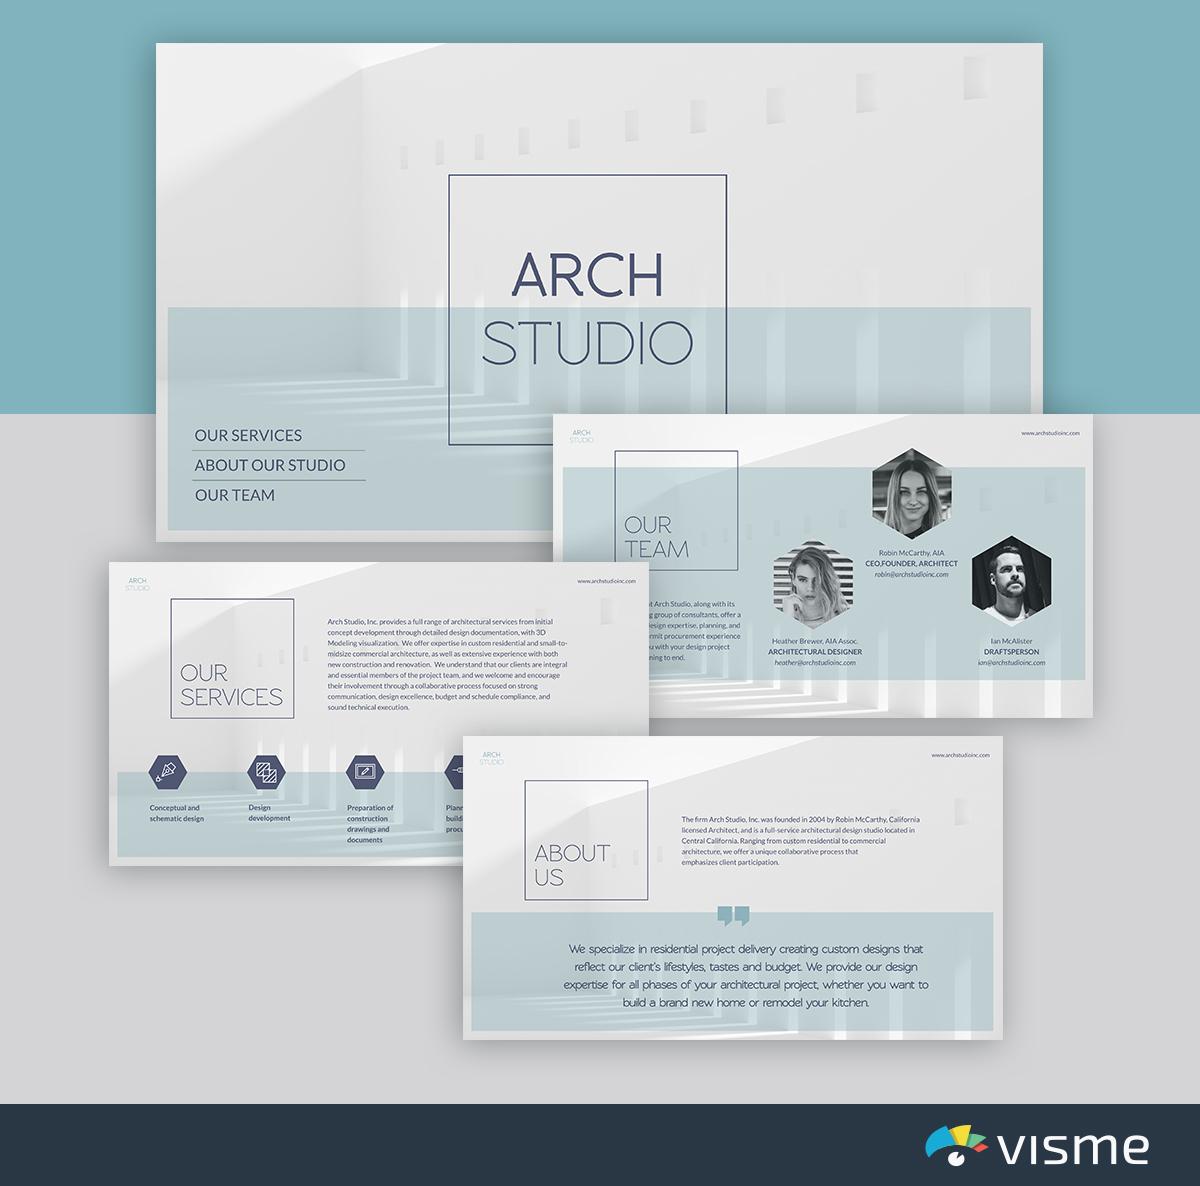 best presentation templates - architecture studio minimalist template visme